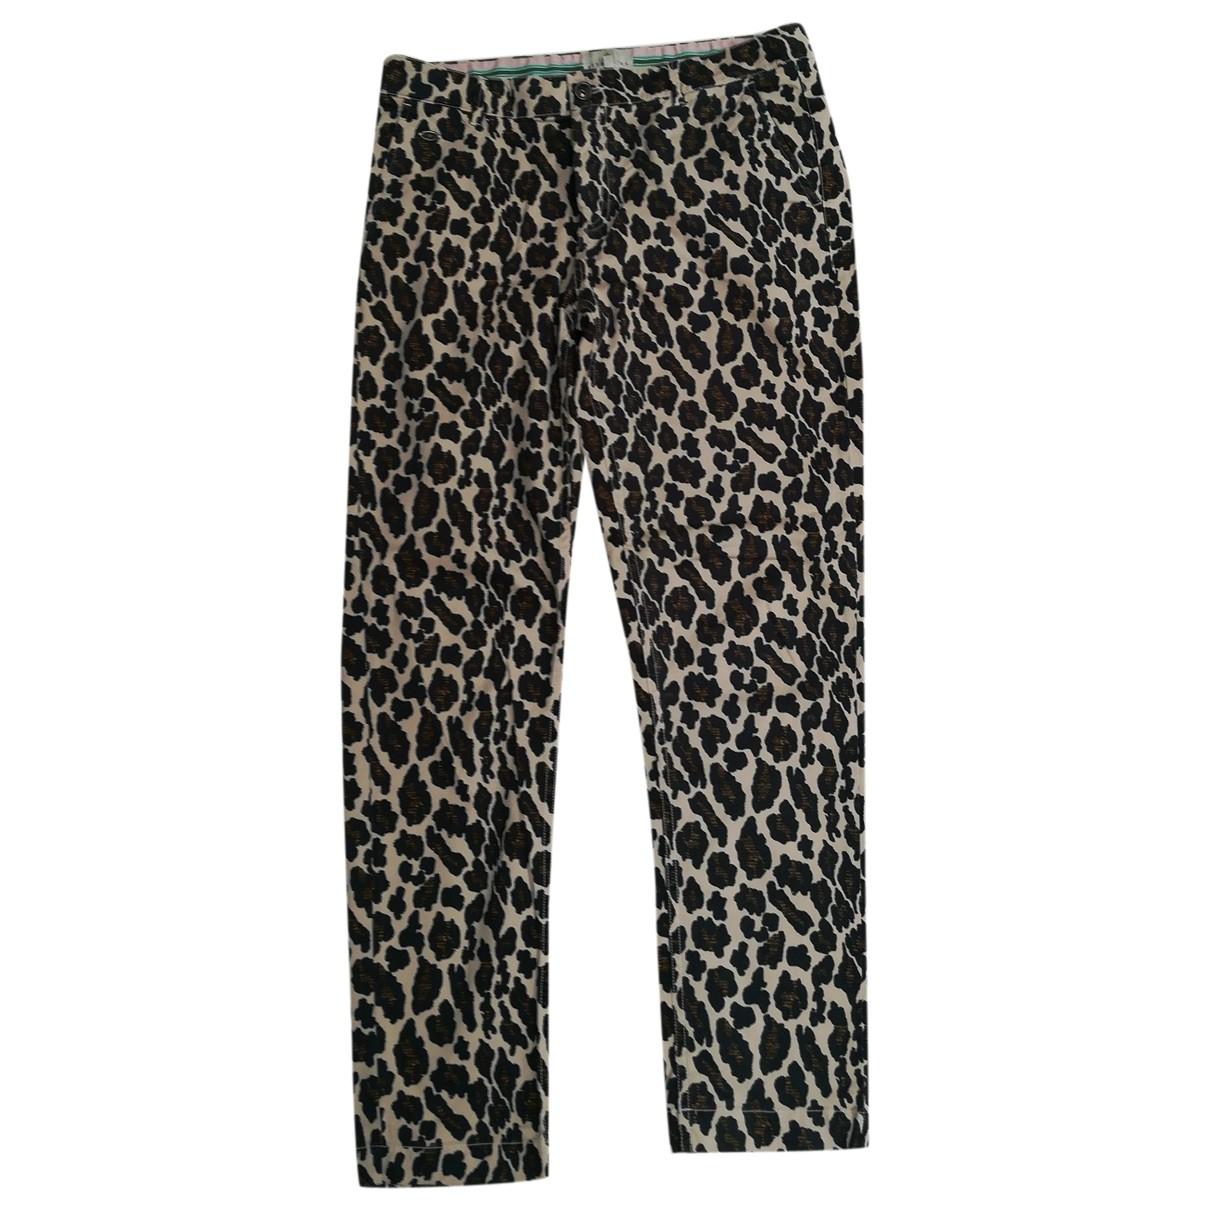 Essentiel Antwerp \N Multicolour Cotton - elasthane Jeans for Women 42 FR